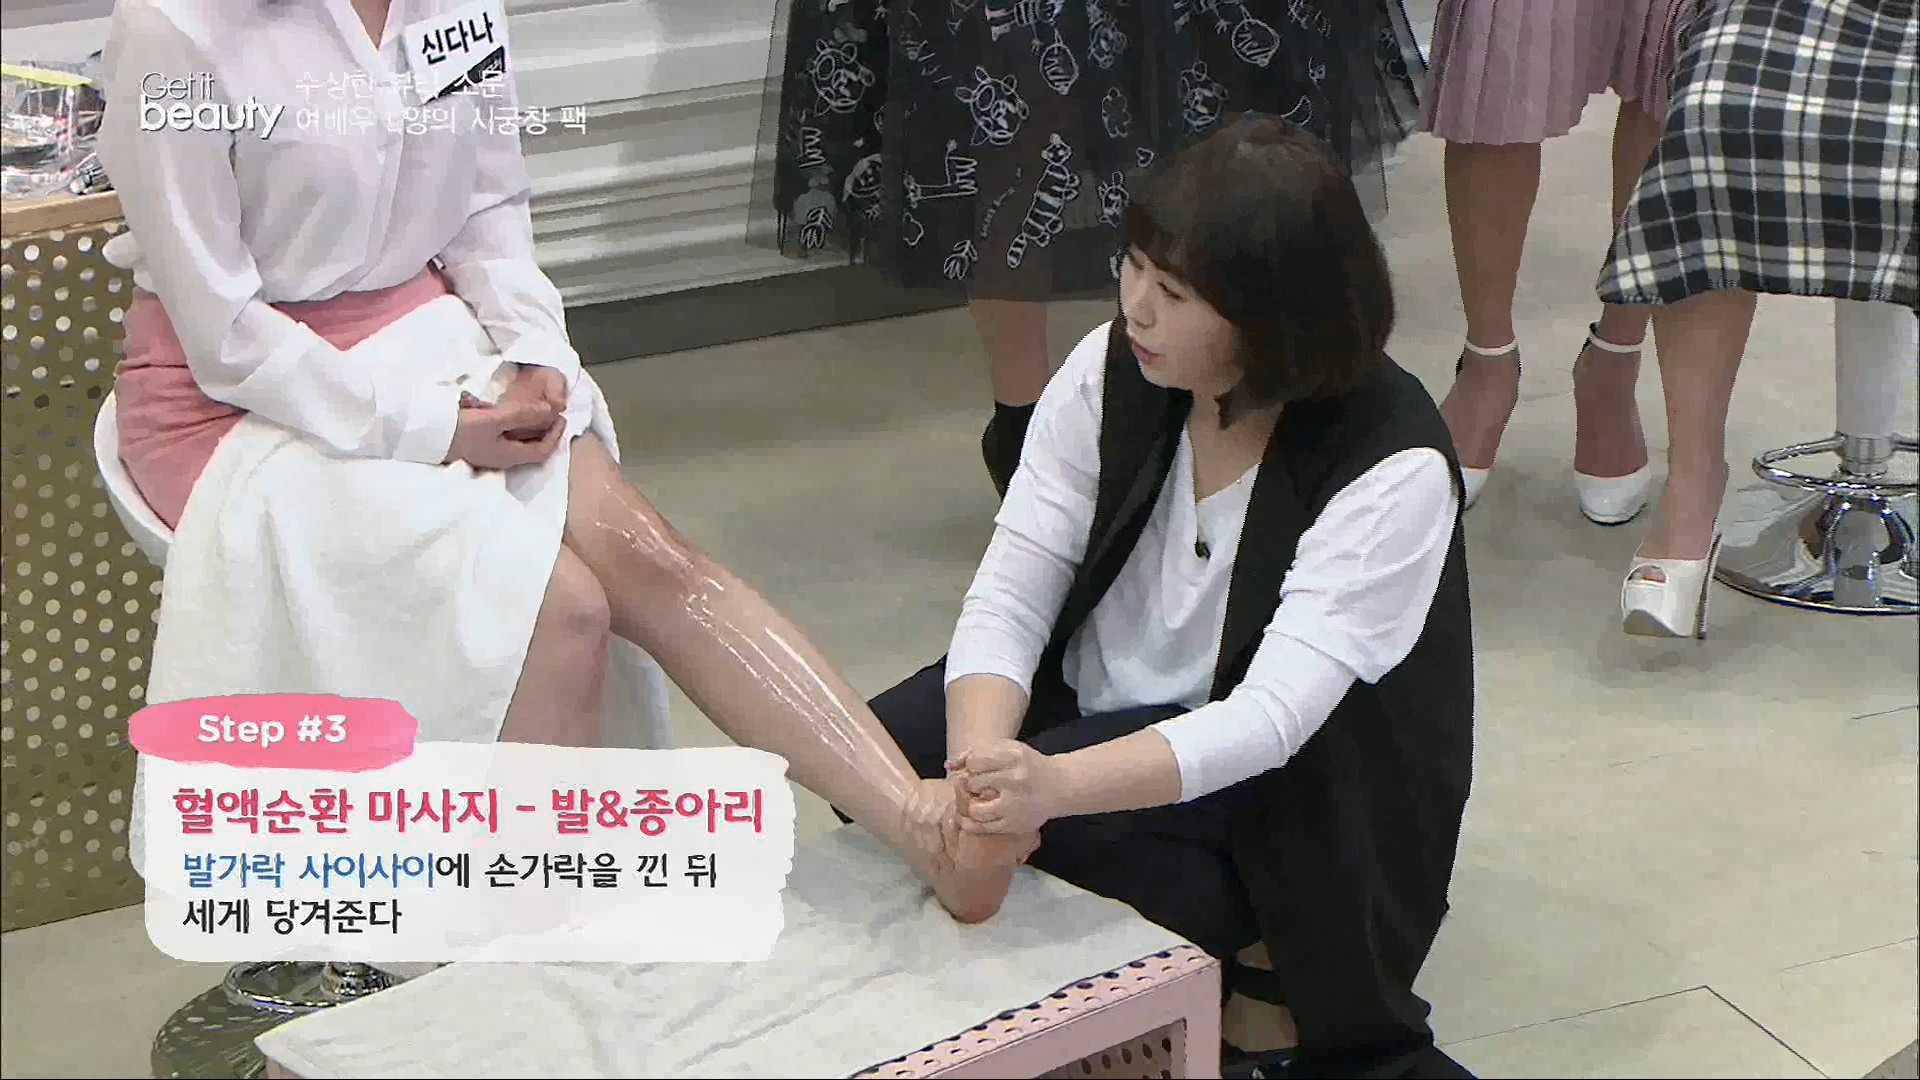 Step#3.혈액순환 마사지-발&종아리 발가락 사이사이에 손가락을 낀 뒤 세게 당겨준다.